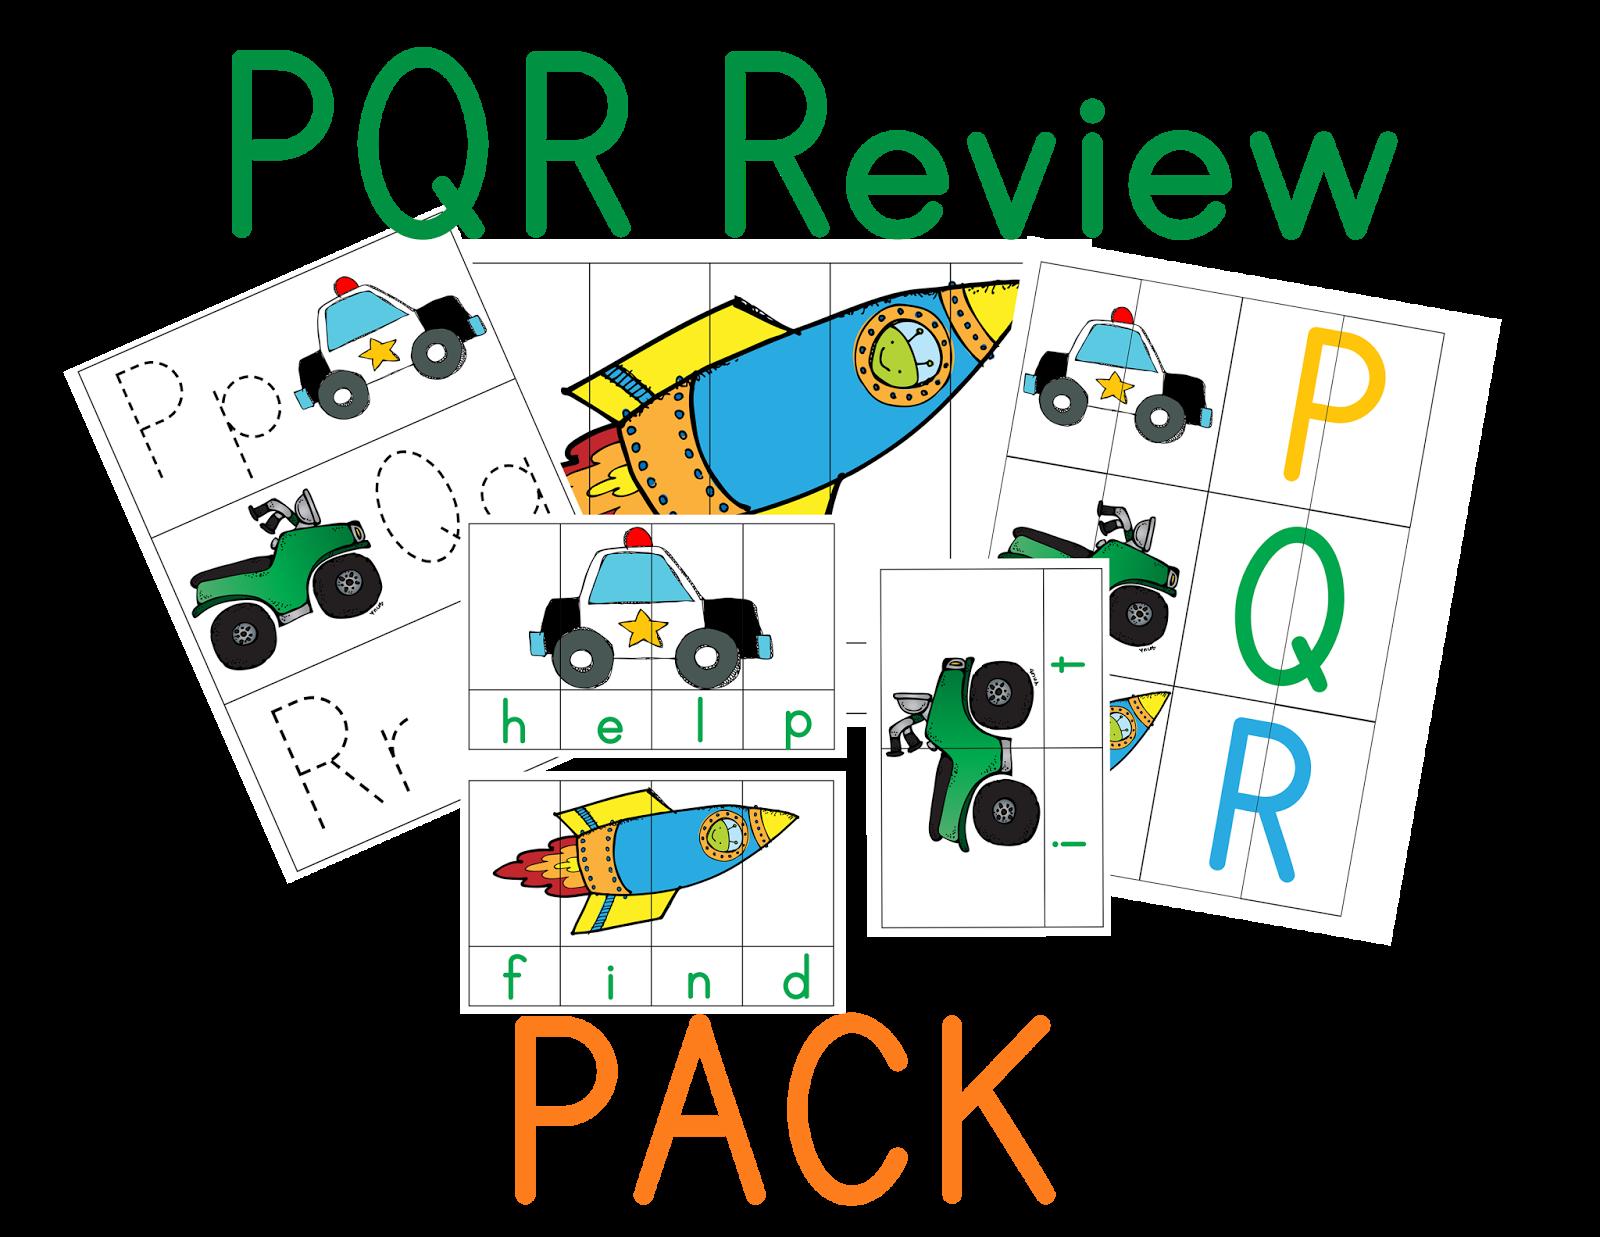 Living Worldsapart Pqr Review Pack Free Printable Pack